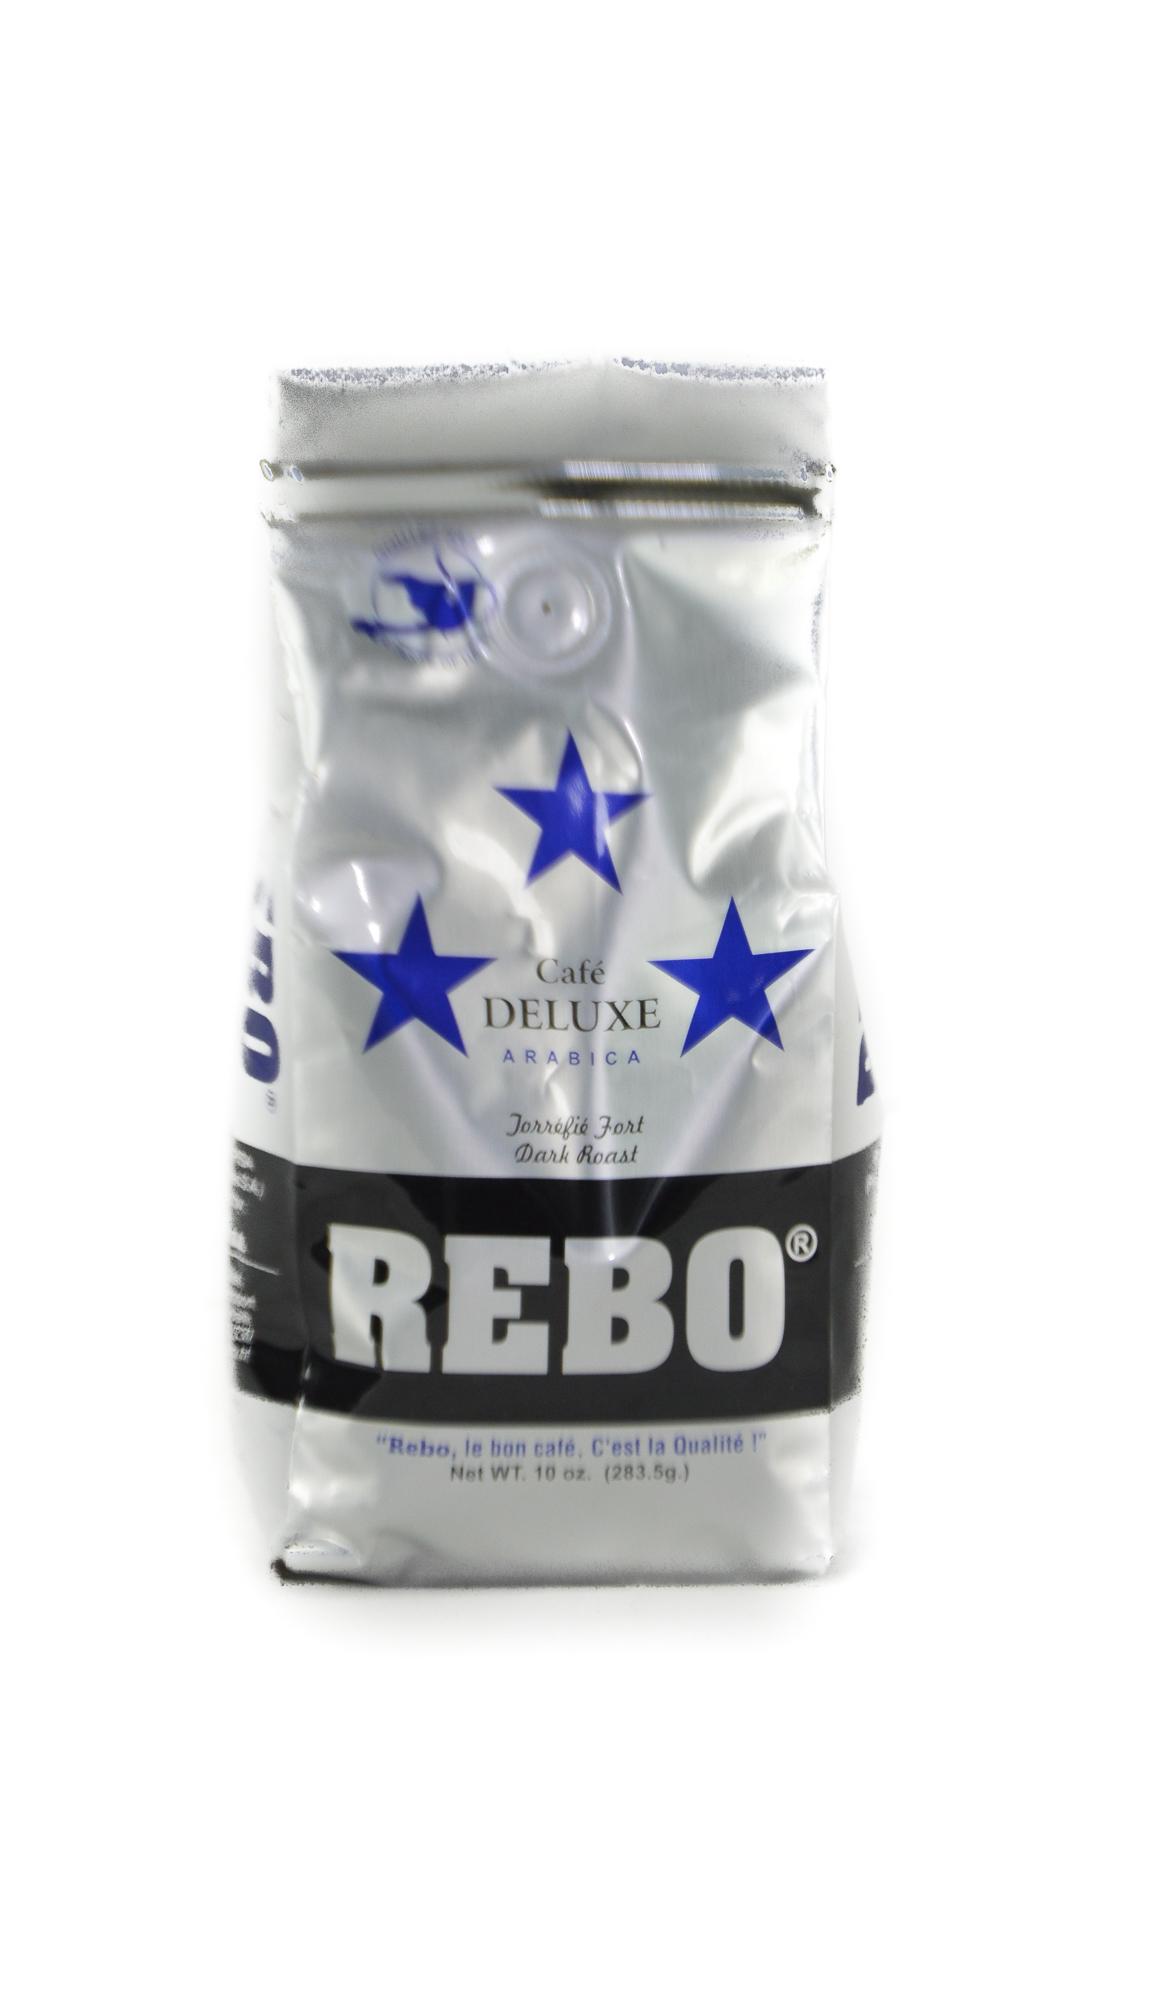 Coffee/Cafe Rebo Deluxe (10 oz)